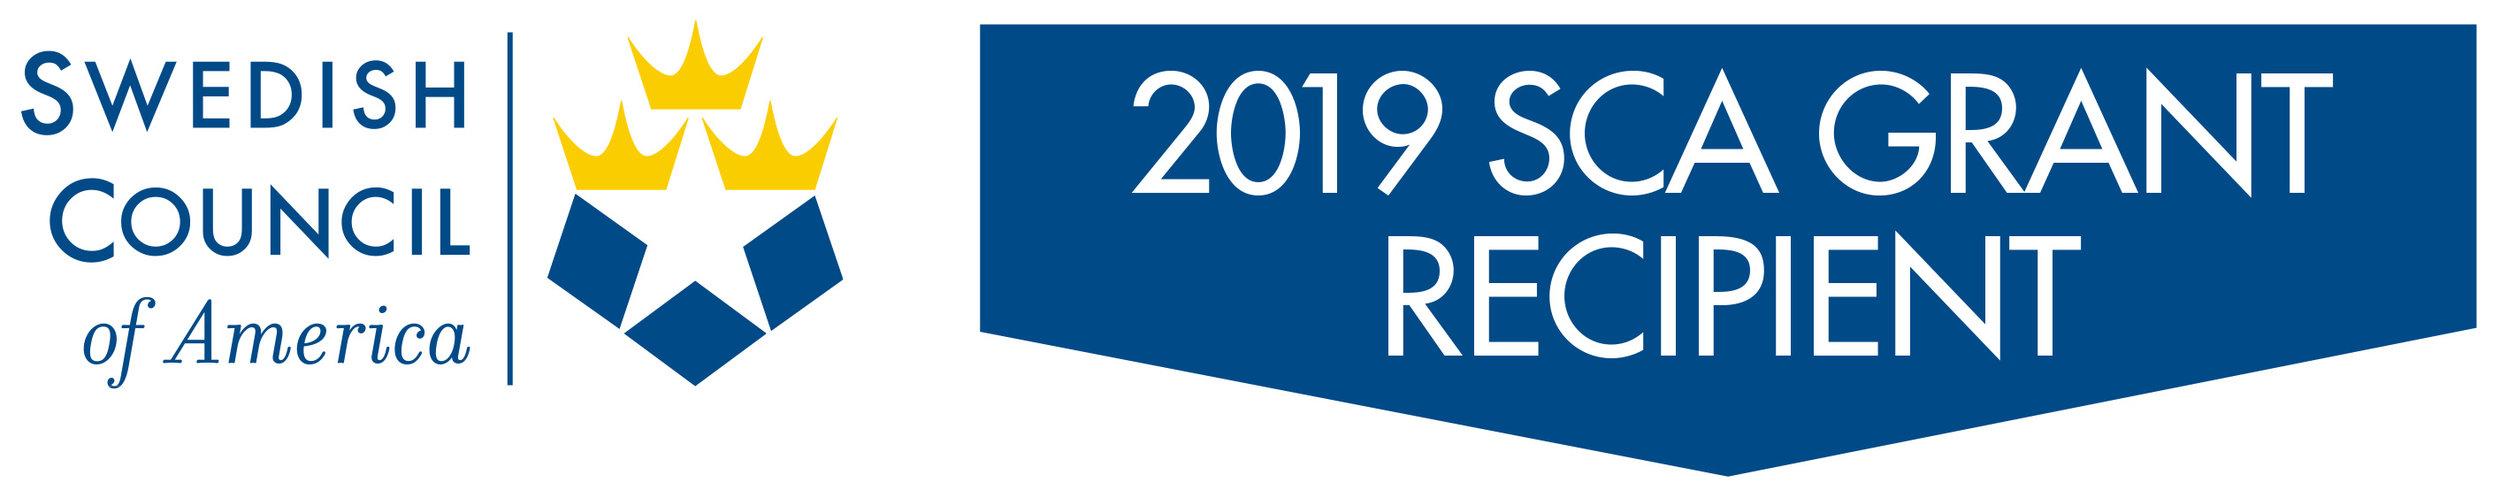 2019-SCA-grant-horizontal.jpg